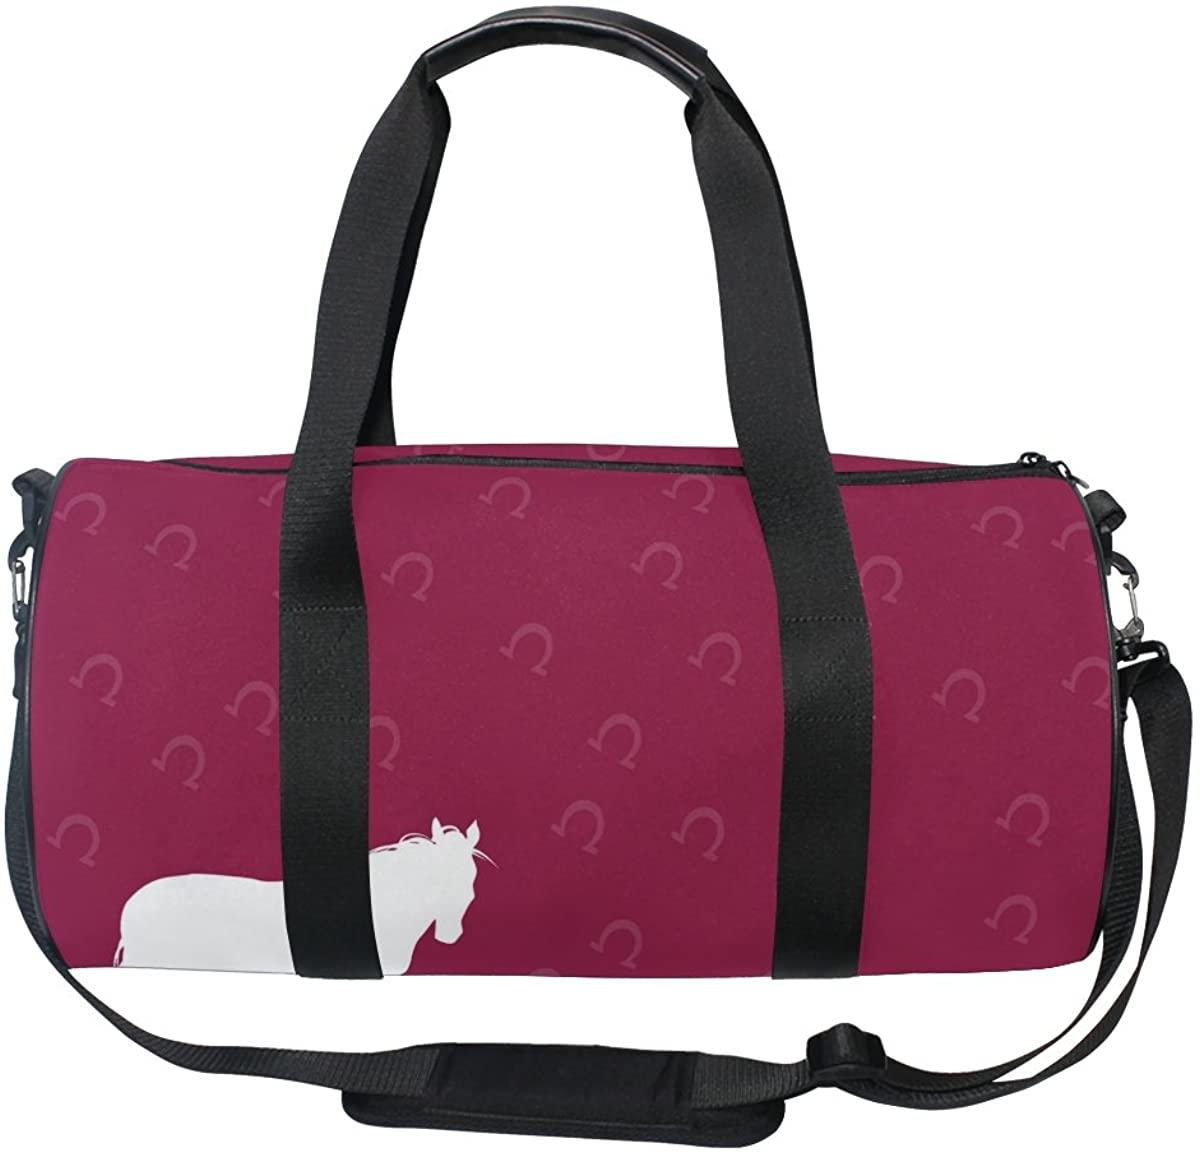 ALAZA White Horse with Grass Sports Gym Duffel Bag Travel Luggage Handbag for Men Women